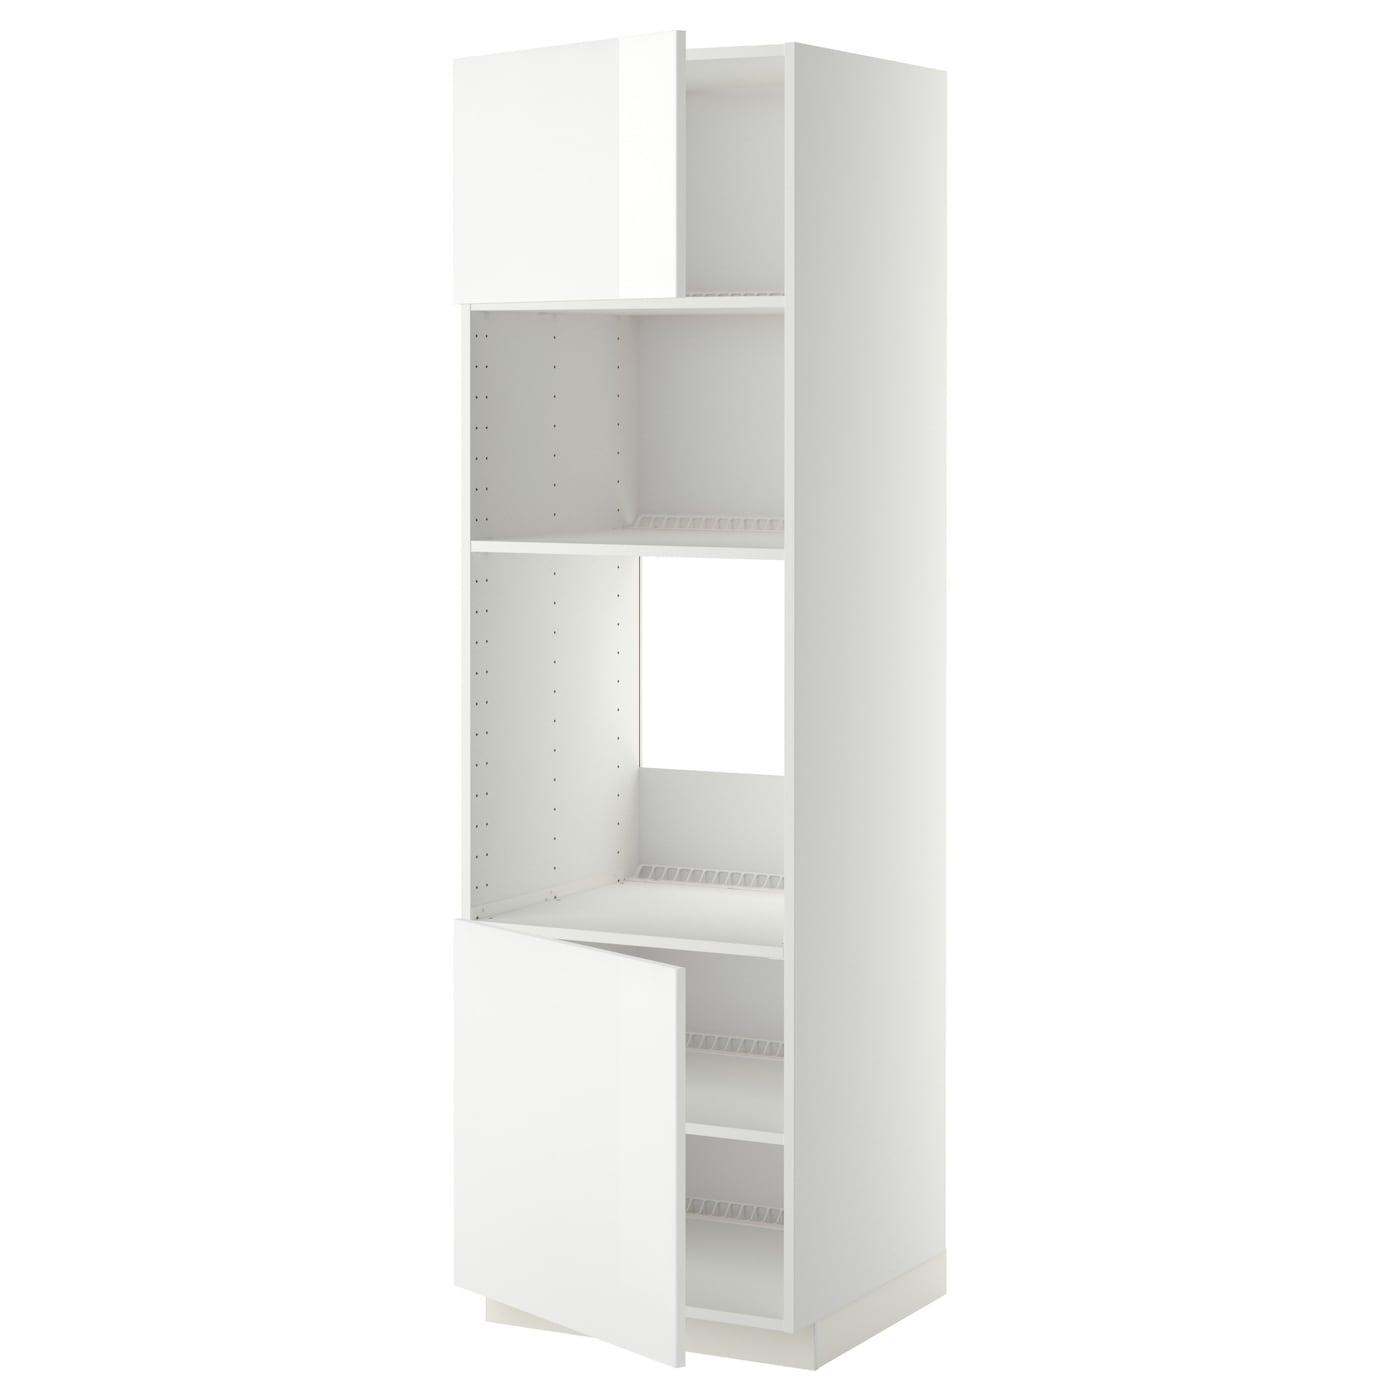 Meuble Micro Onde Ikea metod hi cb f oven/micro w 2 drs/shelves - white, ringhult white 60x60x200  cm